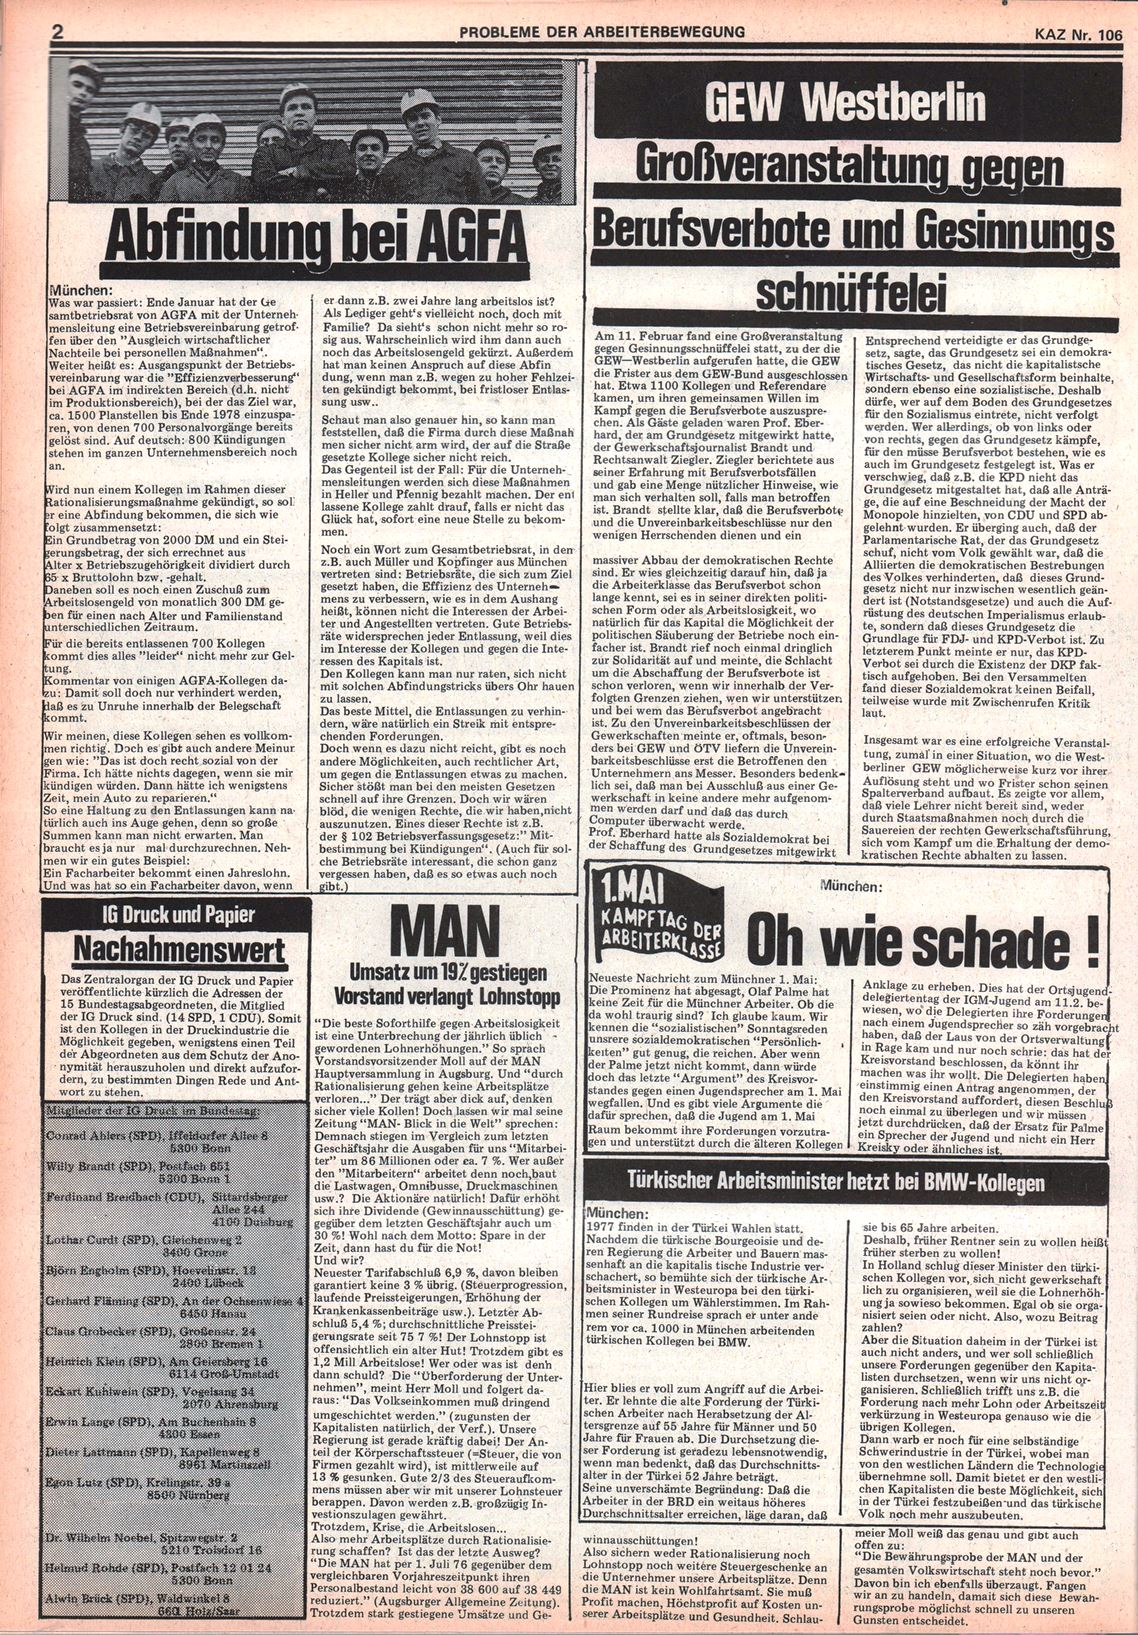 ABG_KAZ_1977_051